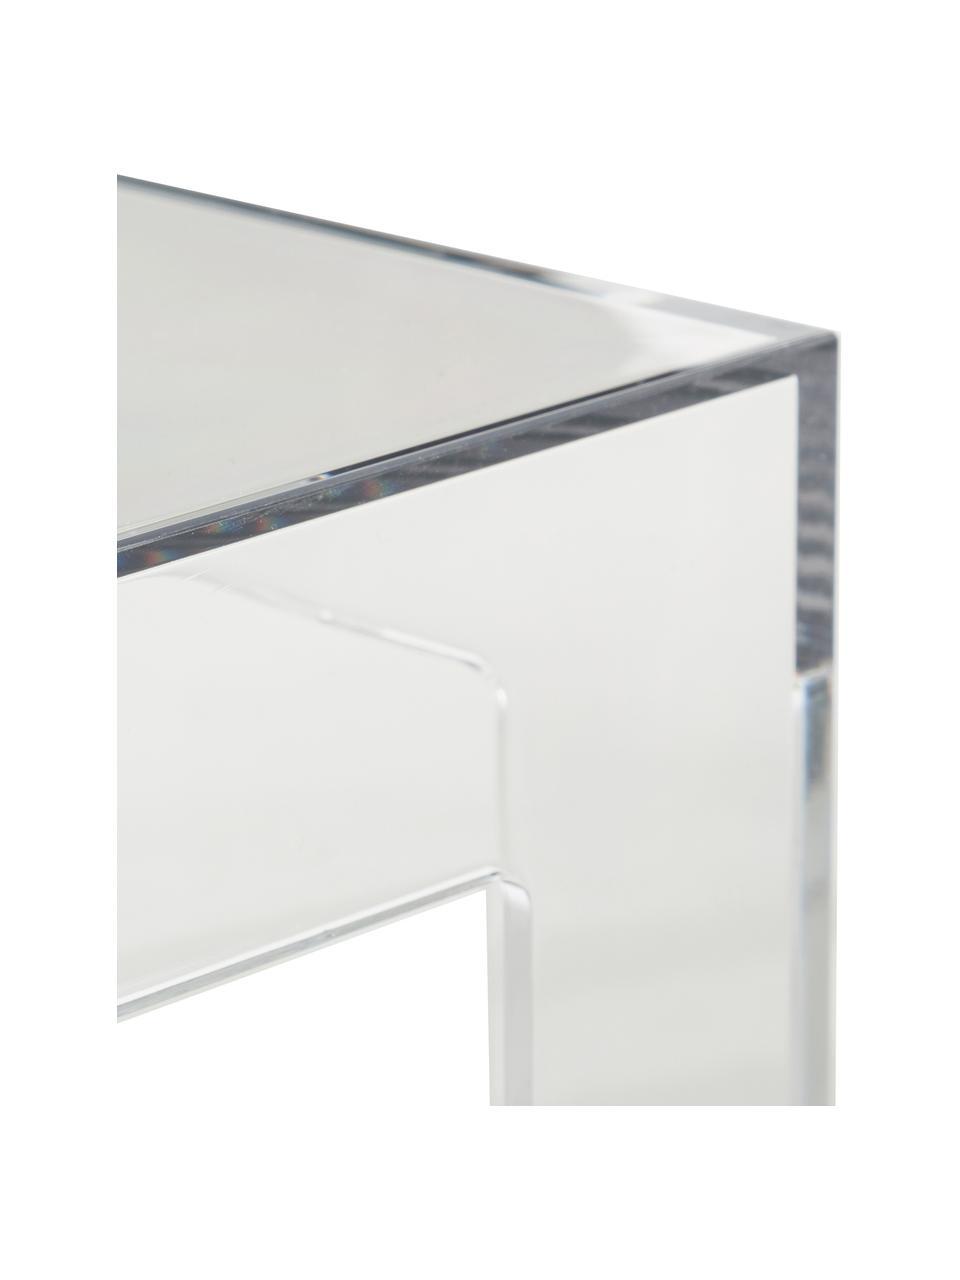 Table d'appoint transparenteJolly, Transparent